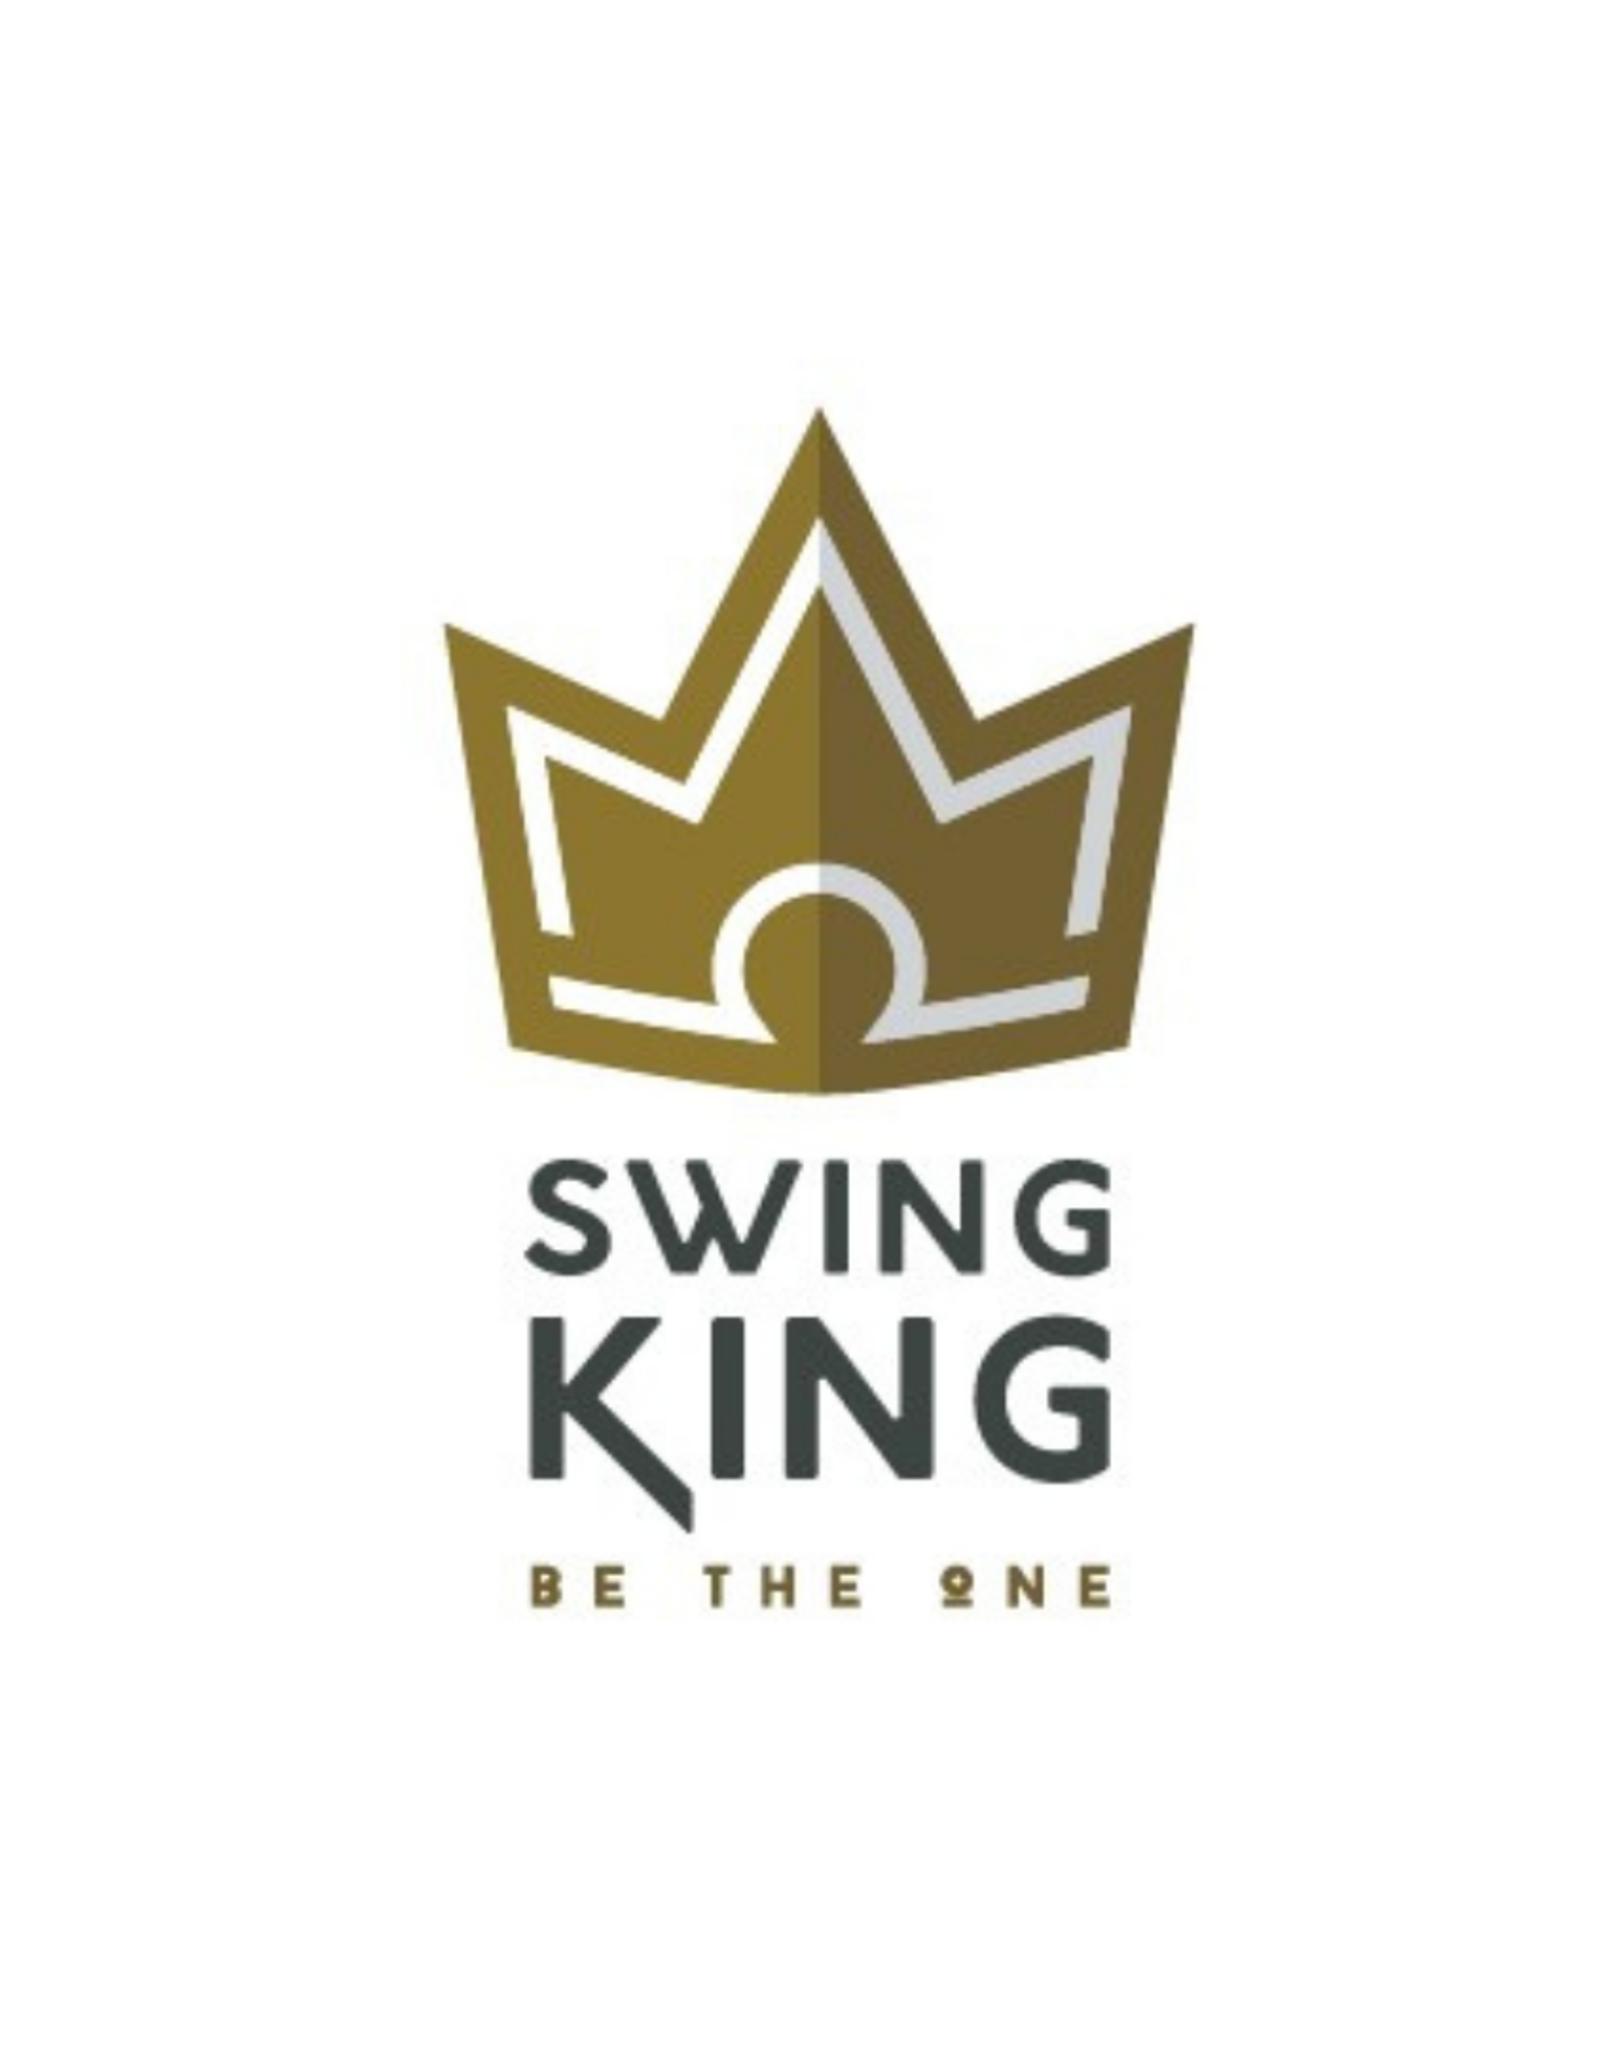 Swing King $10,000 Chance